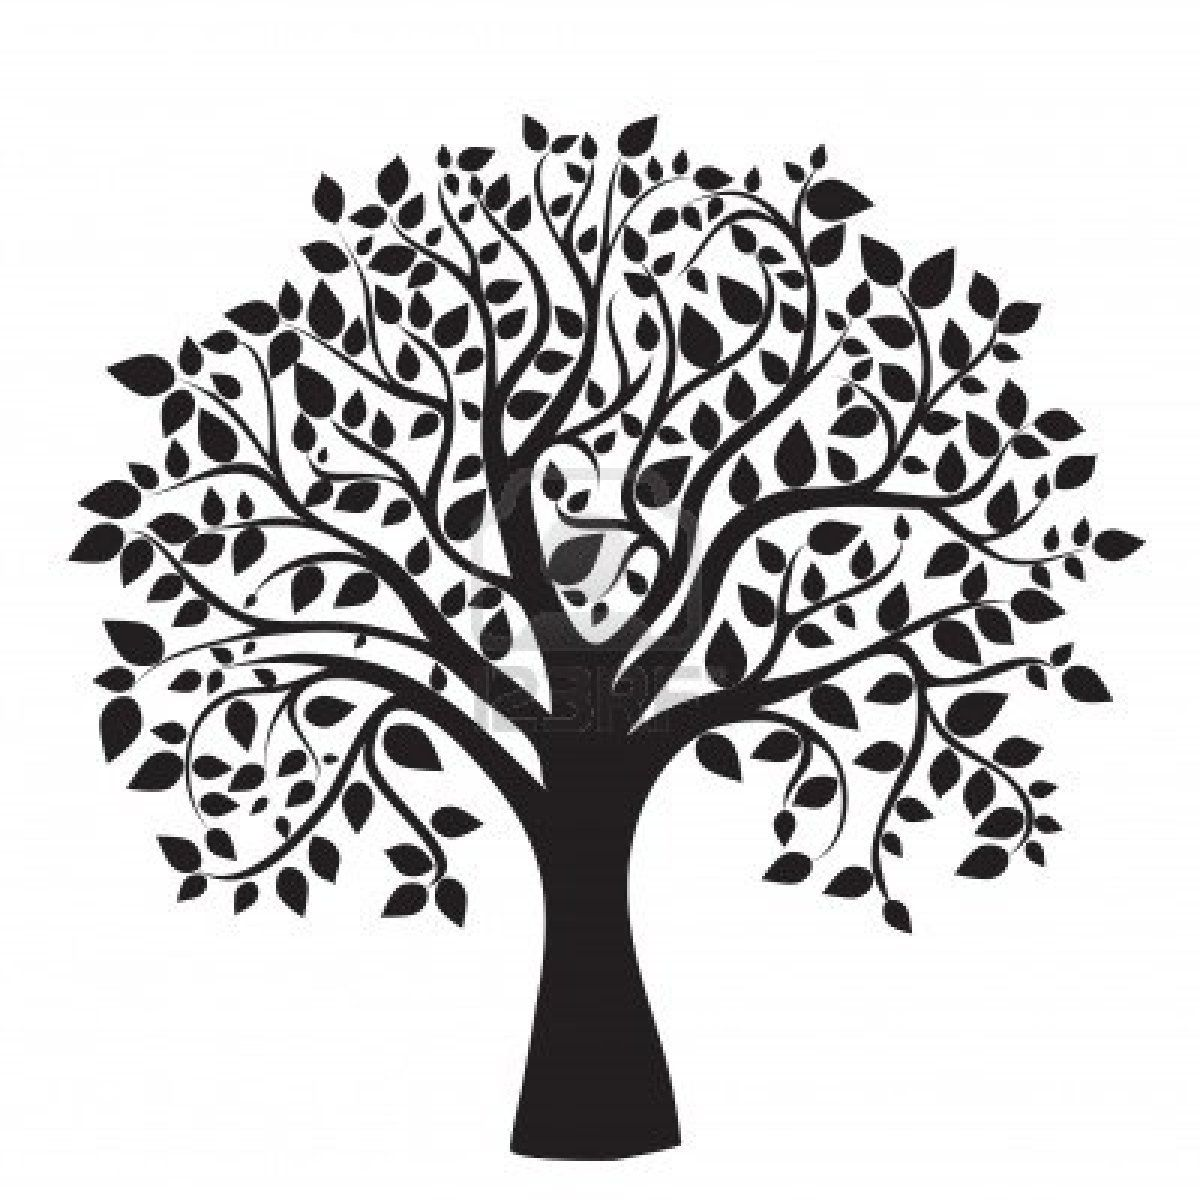 Major oak leaf clipart black and white jpg transparent download Stock Photo | Craft Ideas | Oak tree silhouette, Tree of ... jpg transparent download